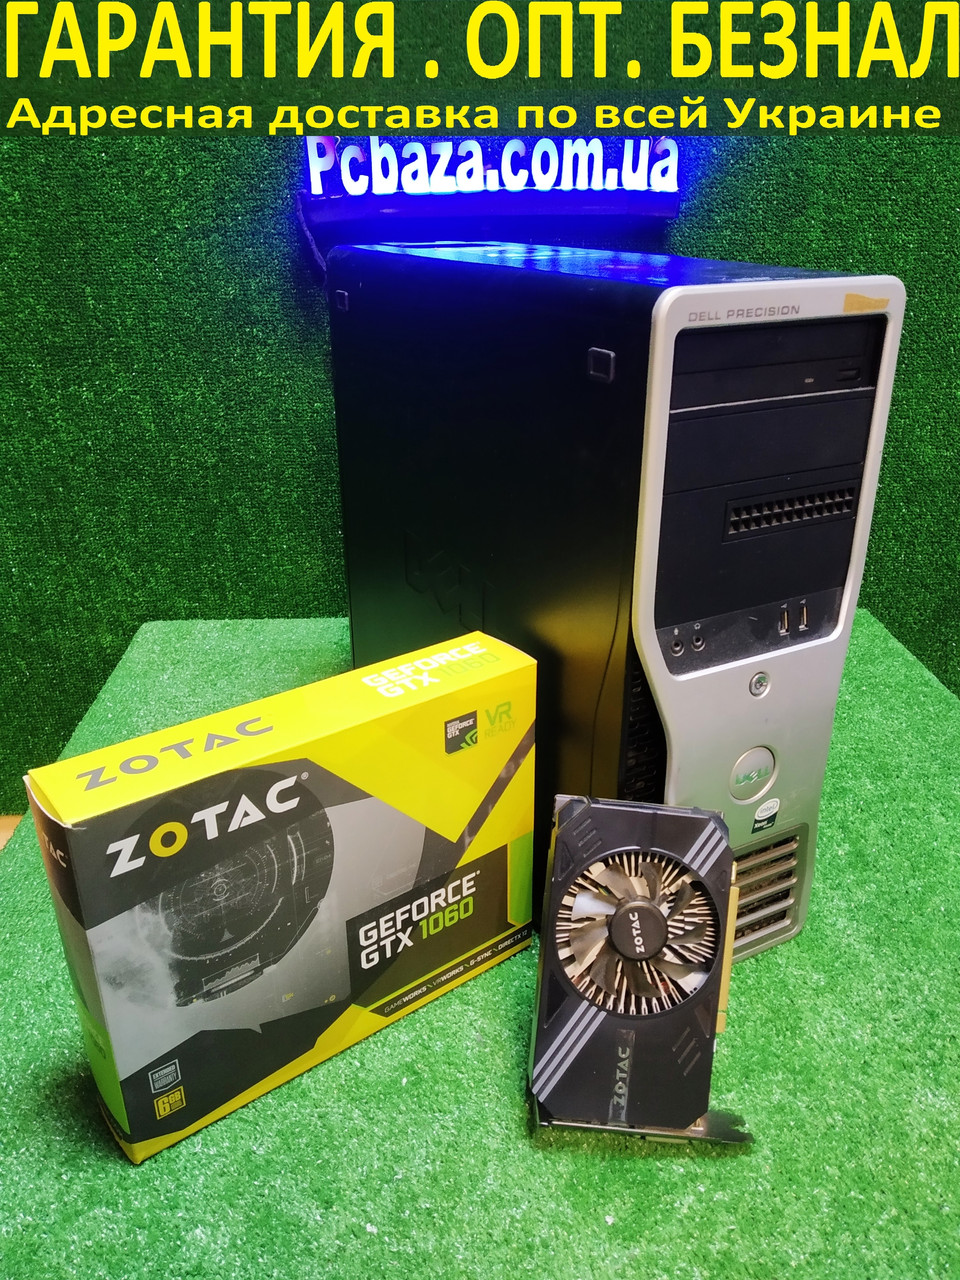 Игровой Настроенный Dell Precision t3500, 6(12) ядер, Core i7 (Xeon) 12gb ОЗУ, 500GB HDD, GTX 1060 6 GB